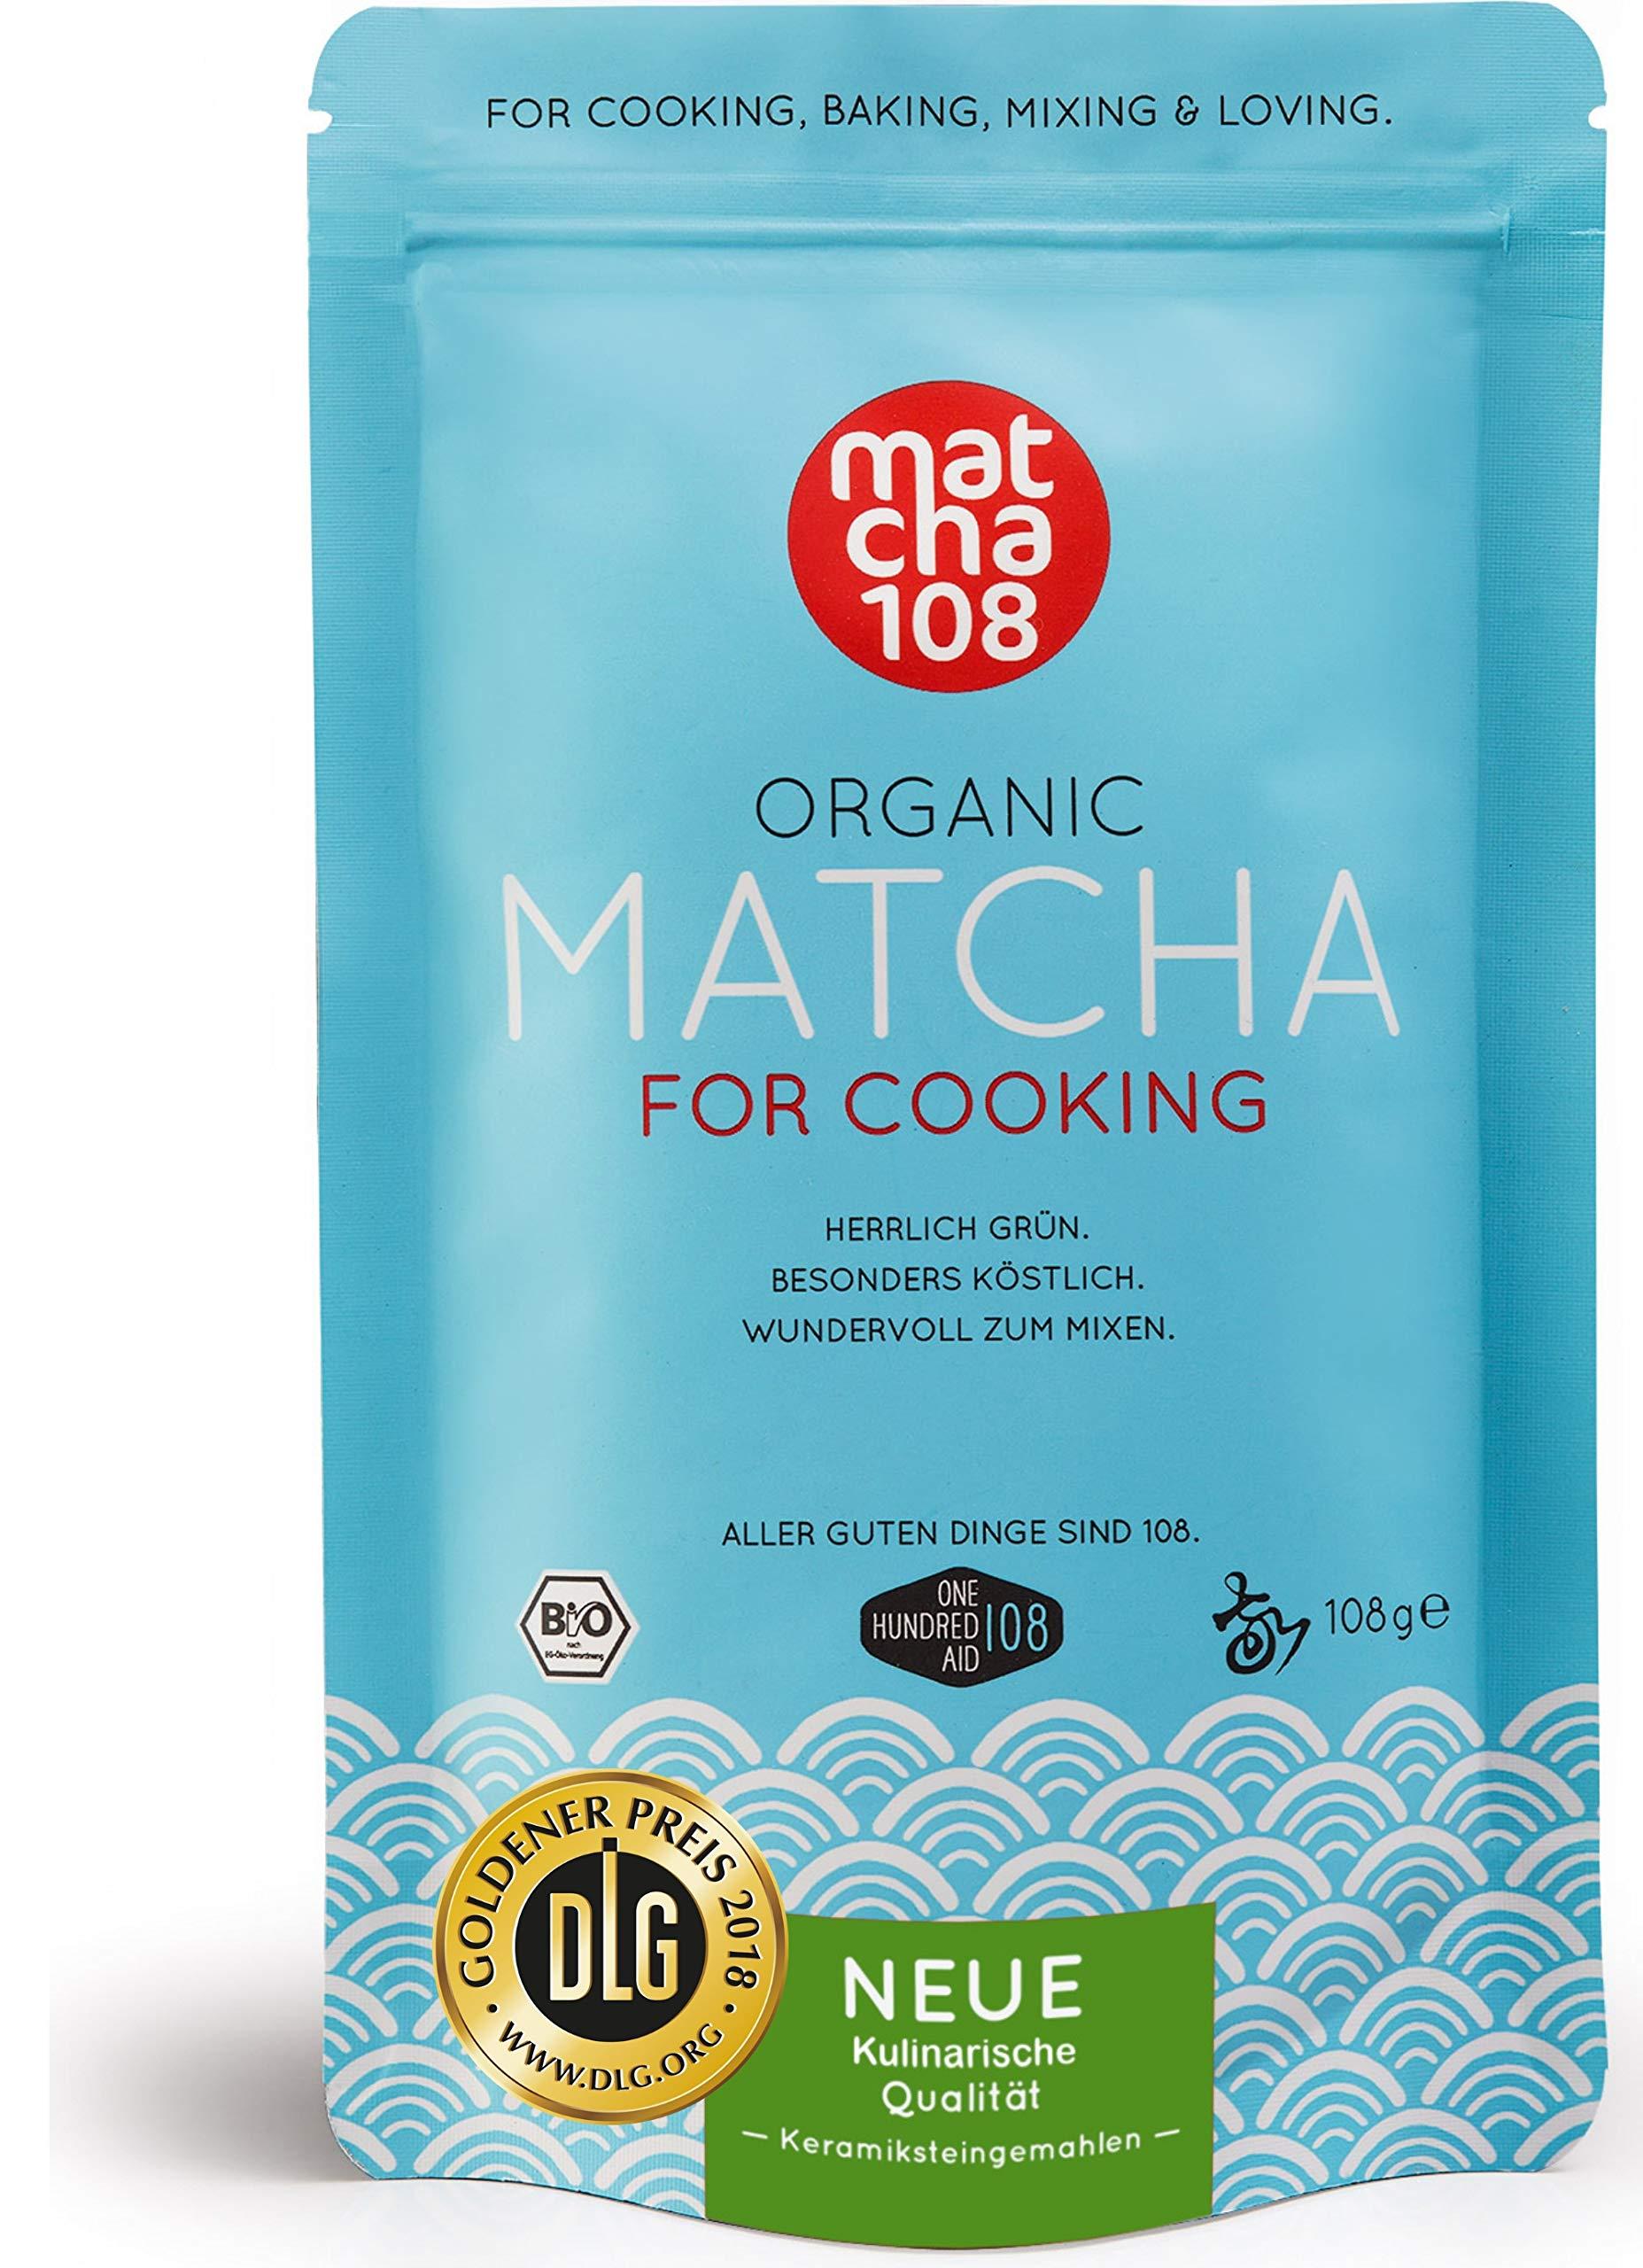 Matcha-Pulver-Tee-108–Bio-Premium-Qualitt-fr-krftiges-Tee-Aroma-zum-Mixen-Ideal-fr-Smoothies-Lattes-zum-Kochen-Backen–Zertifiziertes-Grntee-Pulver-108g-Culinary-Grade-Green-Tea